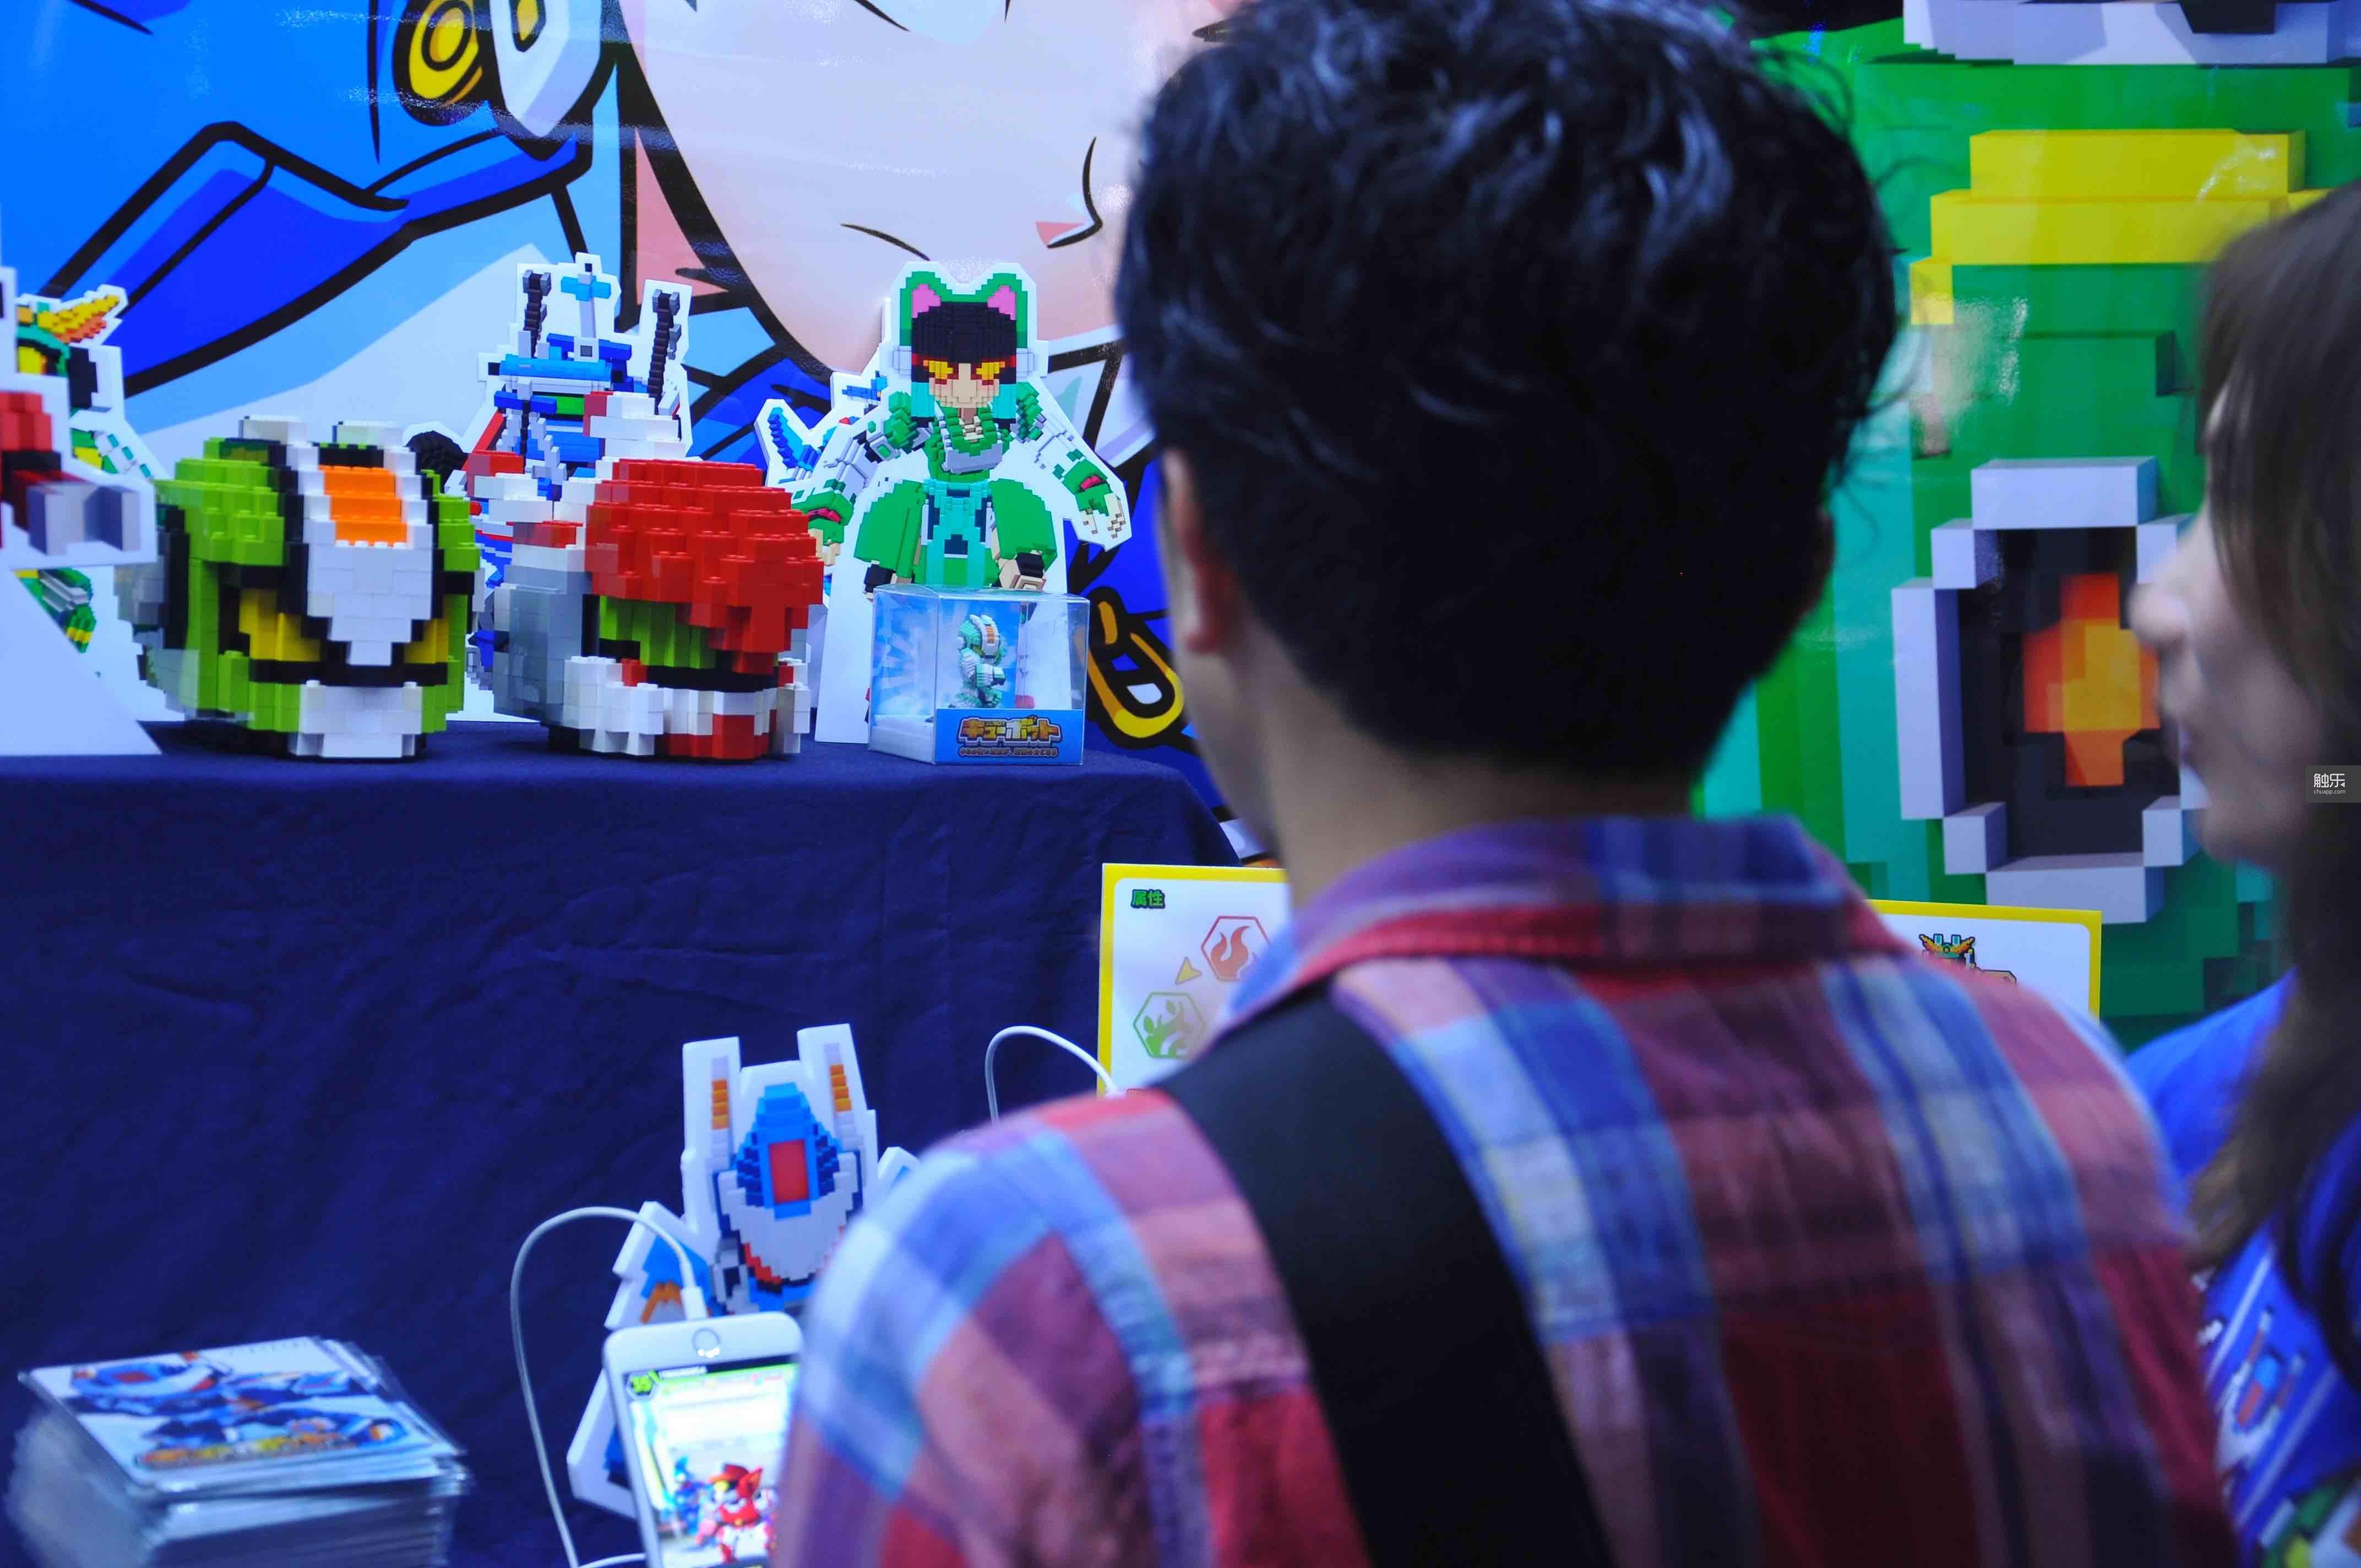 《Qubot》是从2014年3月开始制作的,团队也是在那个时候扩充到了6个人。游戏制作使用的是他们自己开发的引擎,因此得以在游戏中提供编辑器,同时游戏提供了非常真实的爆炸效果,发生爆炸时每个像素方块都会真实地向外爆炸,表现力很强,这也是自研引擎的功劳。 在手游行业,我们都是年纪比较大,做游戏有20年了,所以我们比较喜欢这种复古风格的东西。Owen向我解释为什么他们如此钟情于3D像素的风格。最早制作《Qubot》时,Qubit Games还没有明确的思路。他们想要沿用第一款作品《Space Qube》的美